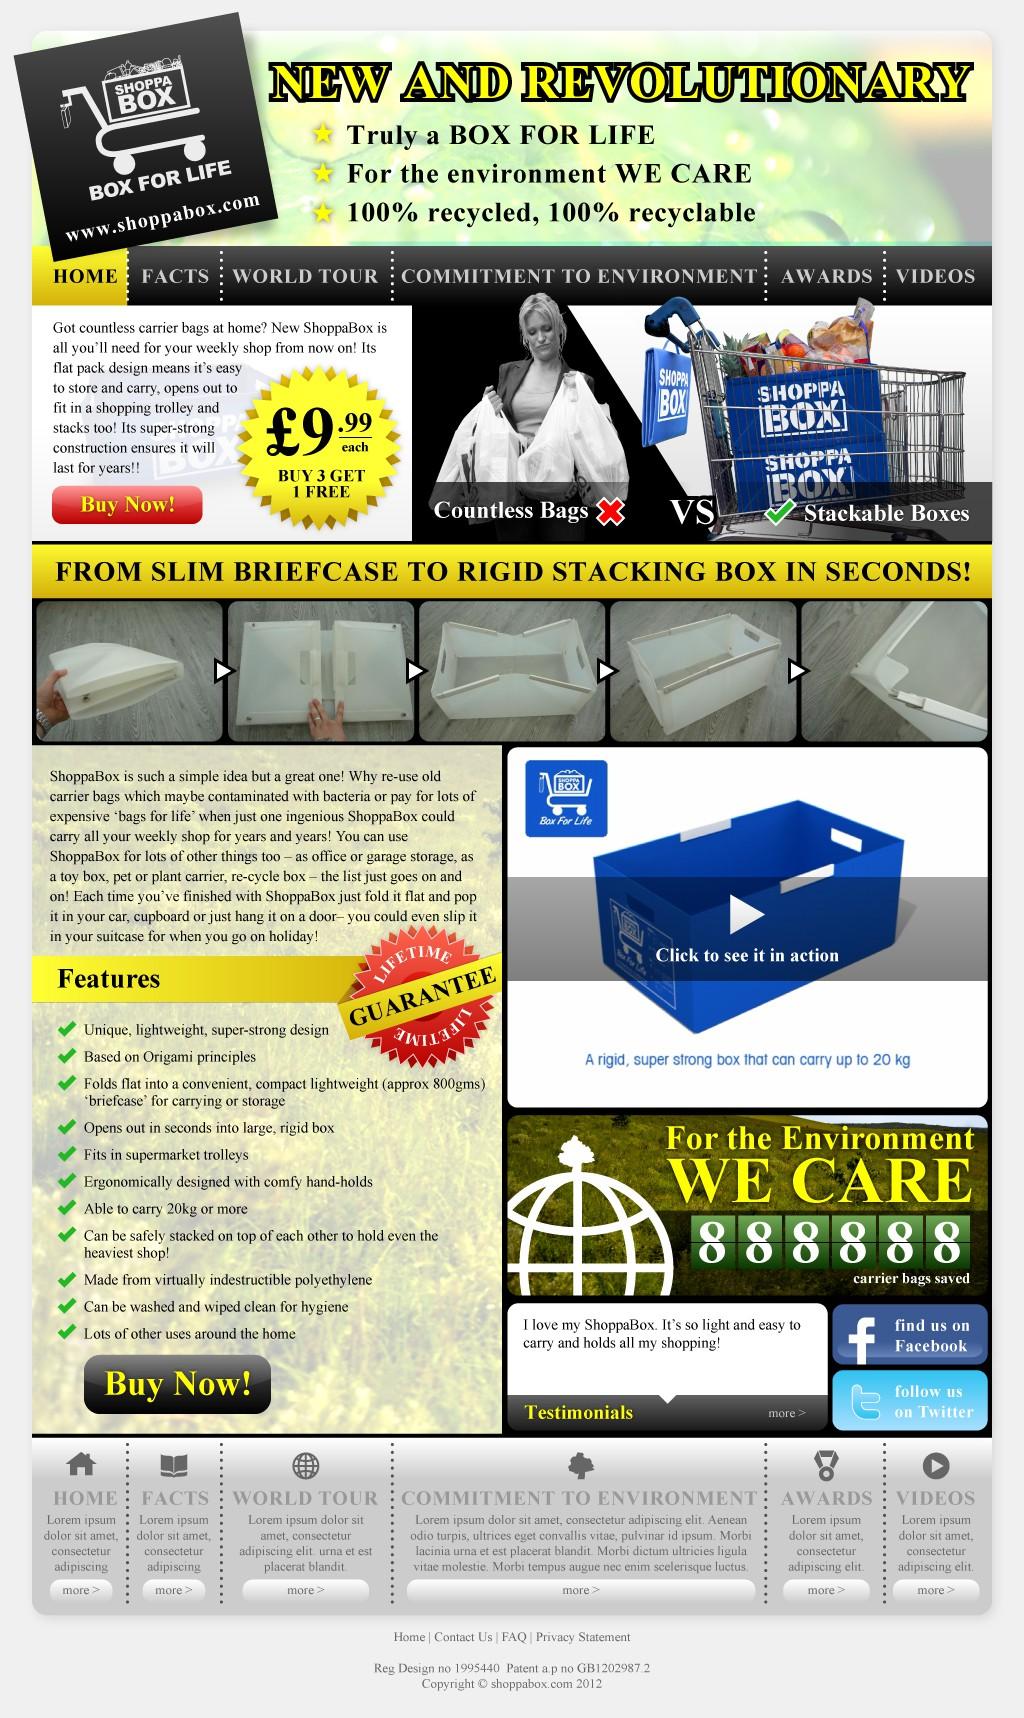 Help ShoppaBox Limited - www.shoppabox.com with a new website design